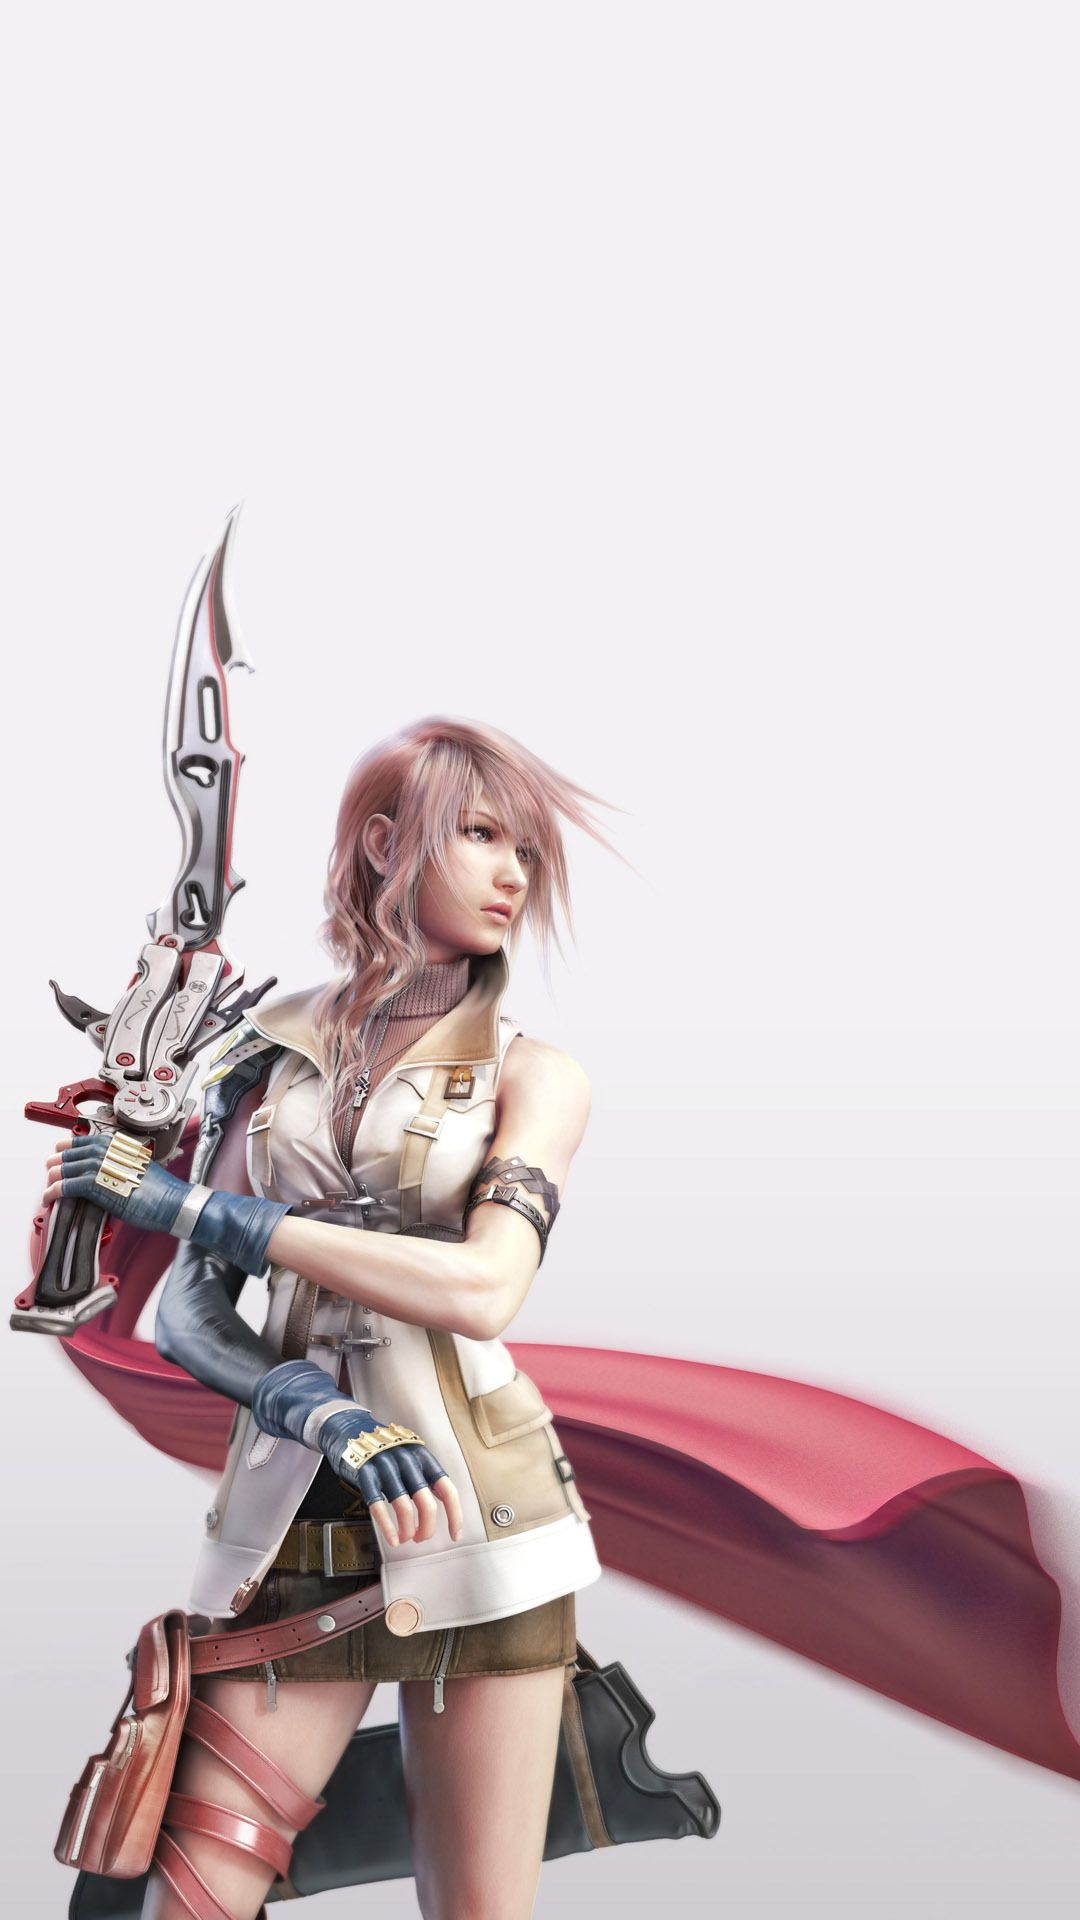 Ff Xiii Wallpapers Group Lightning Final Fantasy Final Fantasy